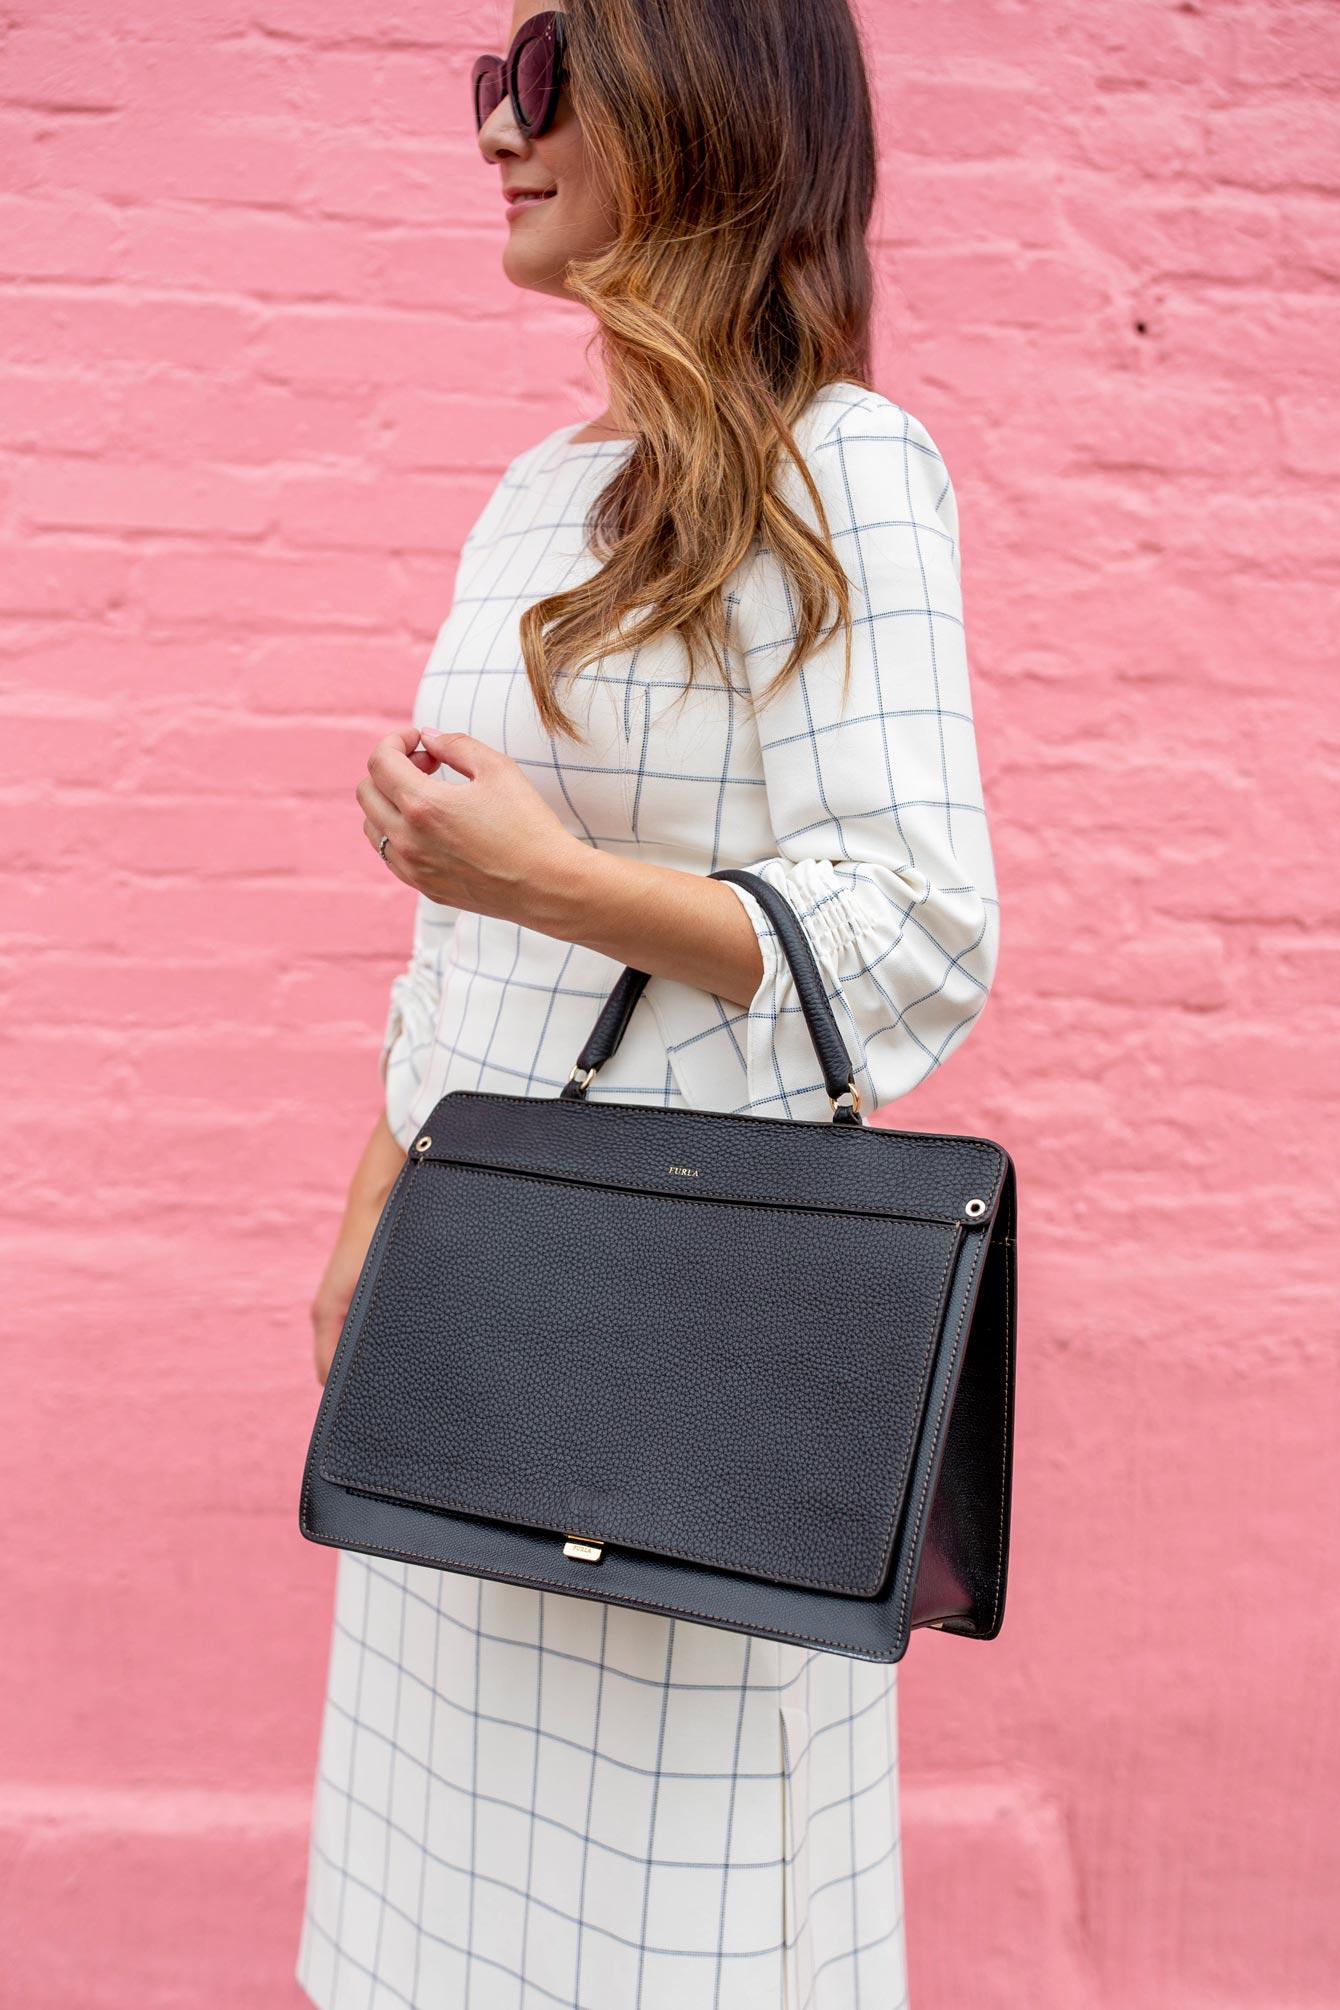 Furla Top Handle Convertible Bag